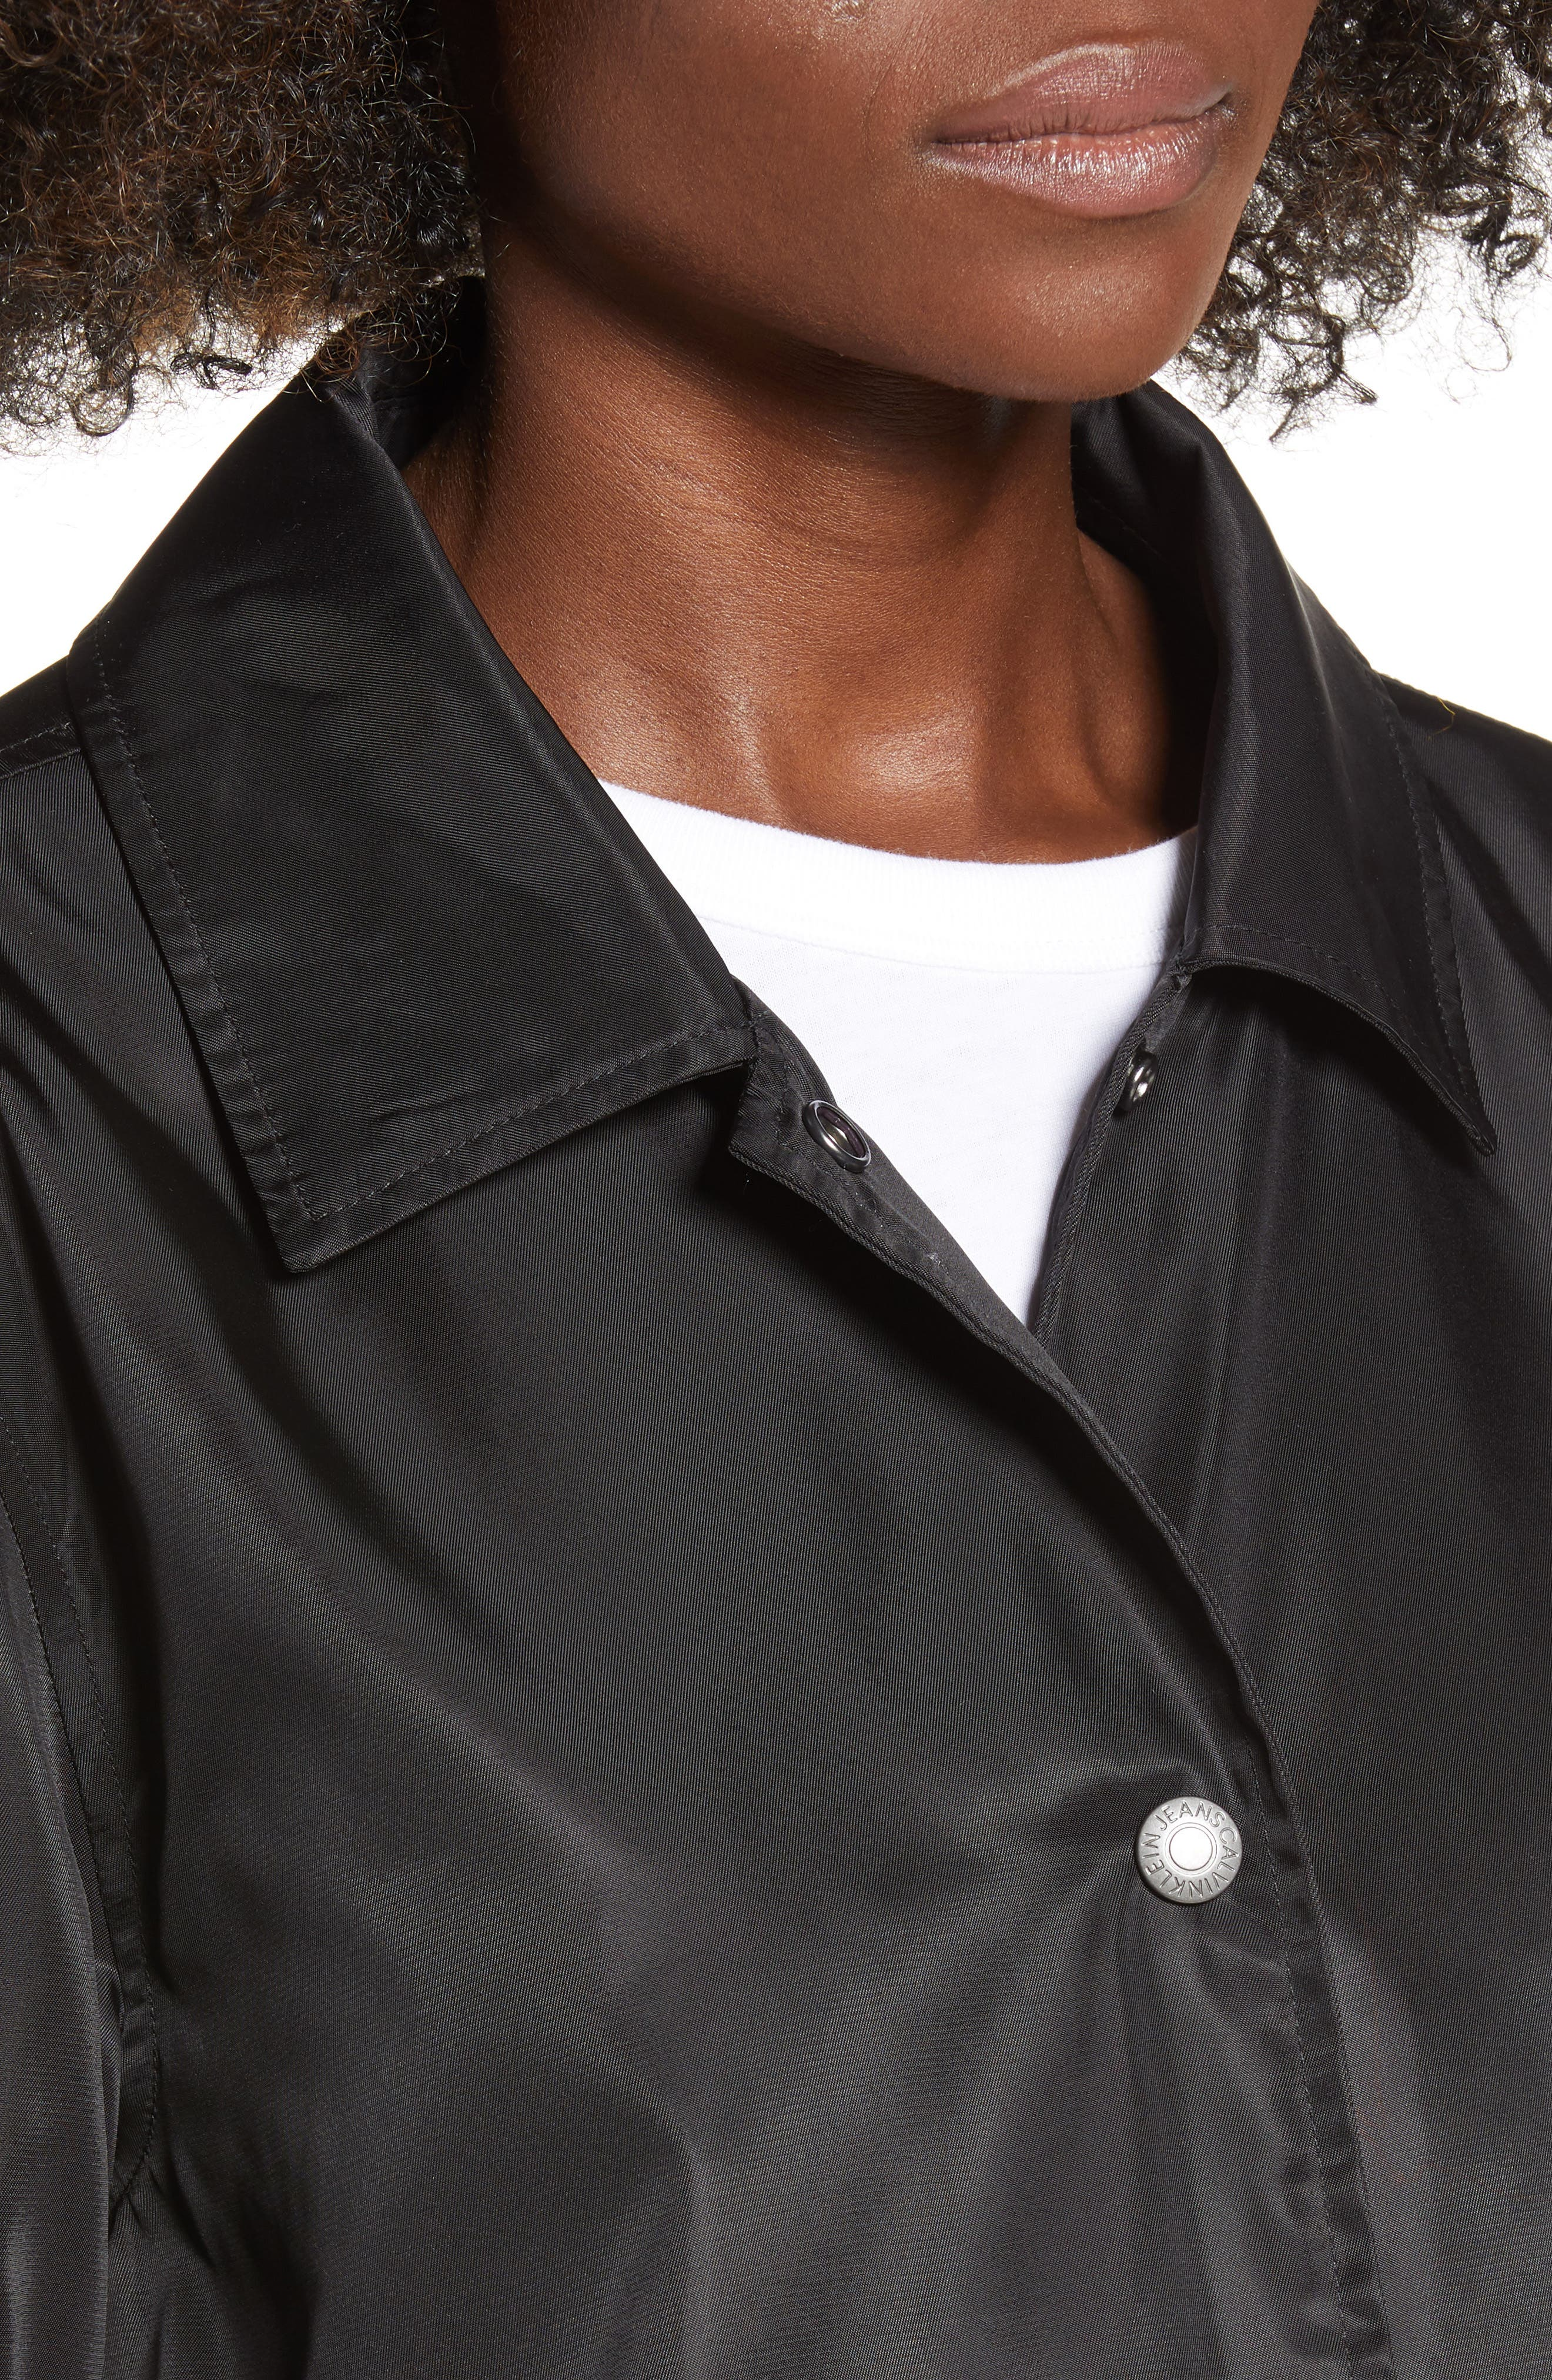 Coach Jacket,                             Alternate thumbnail 4, color,                             BLACK